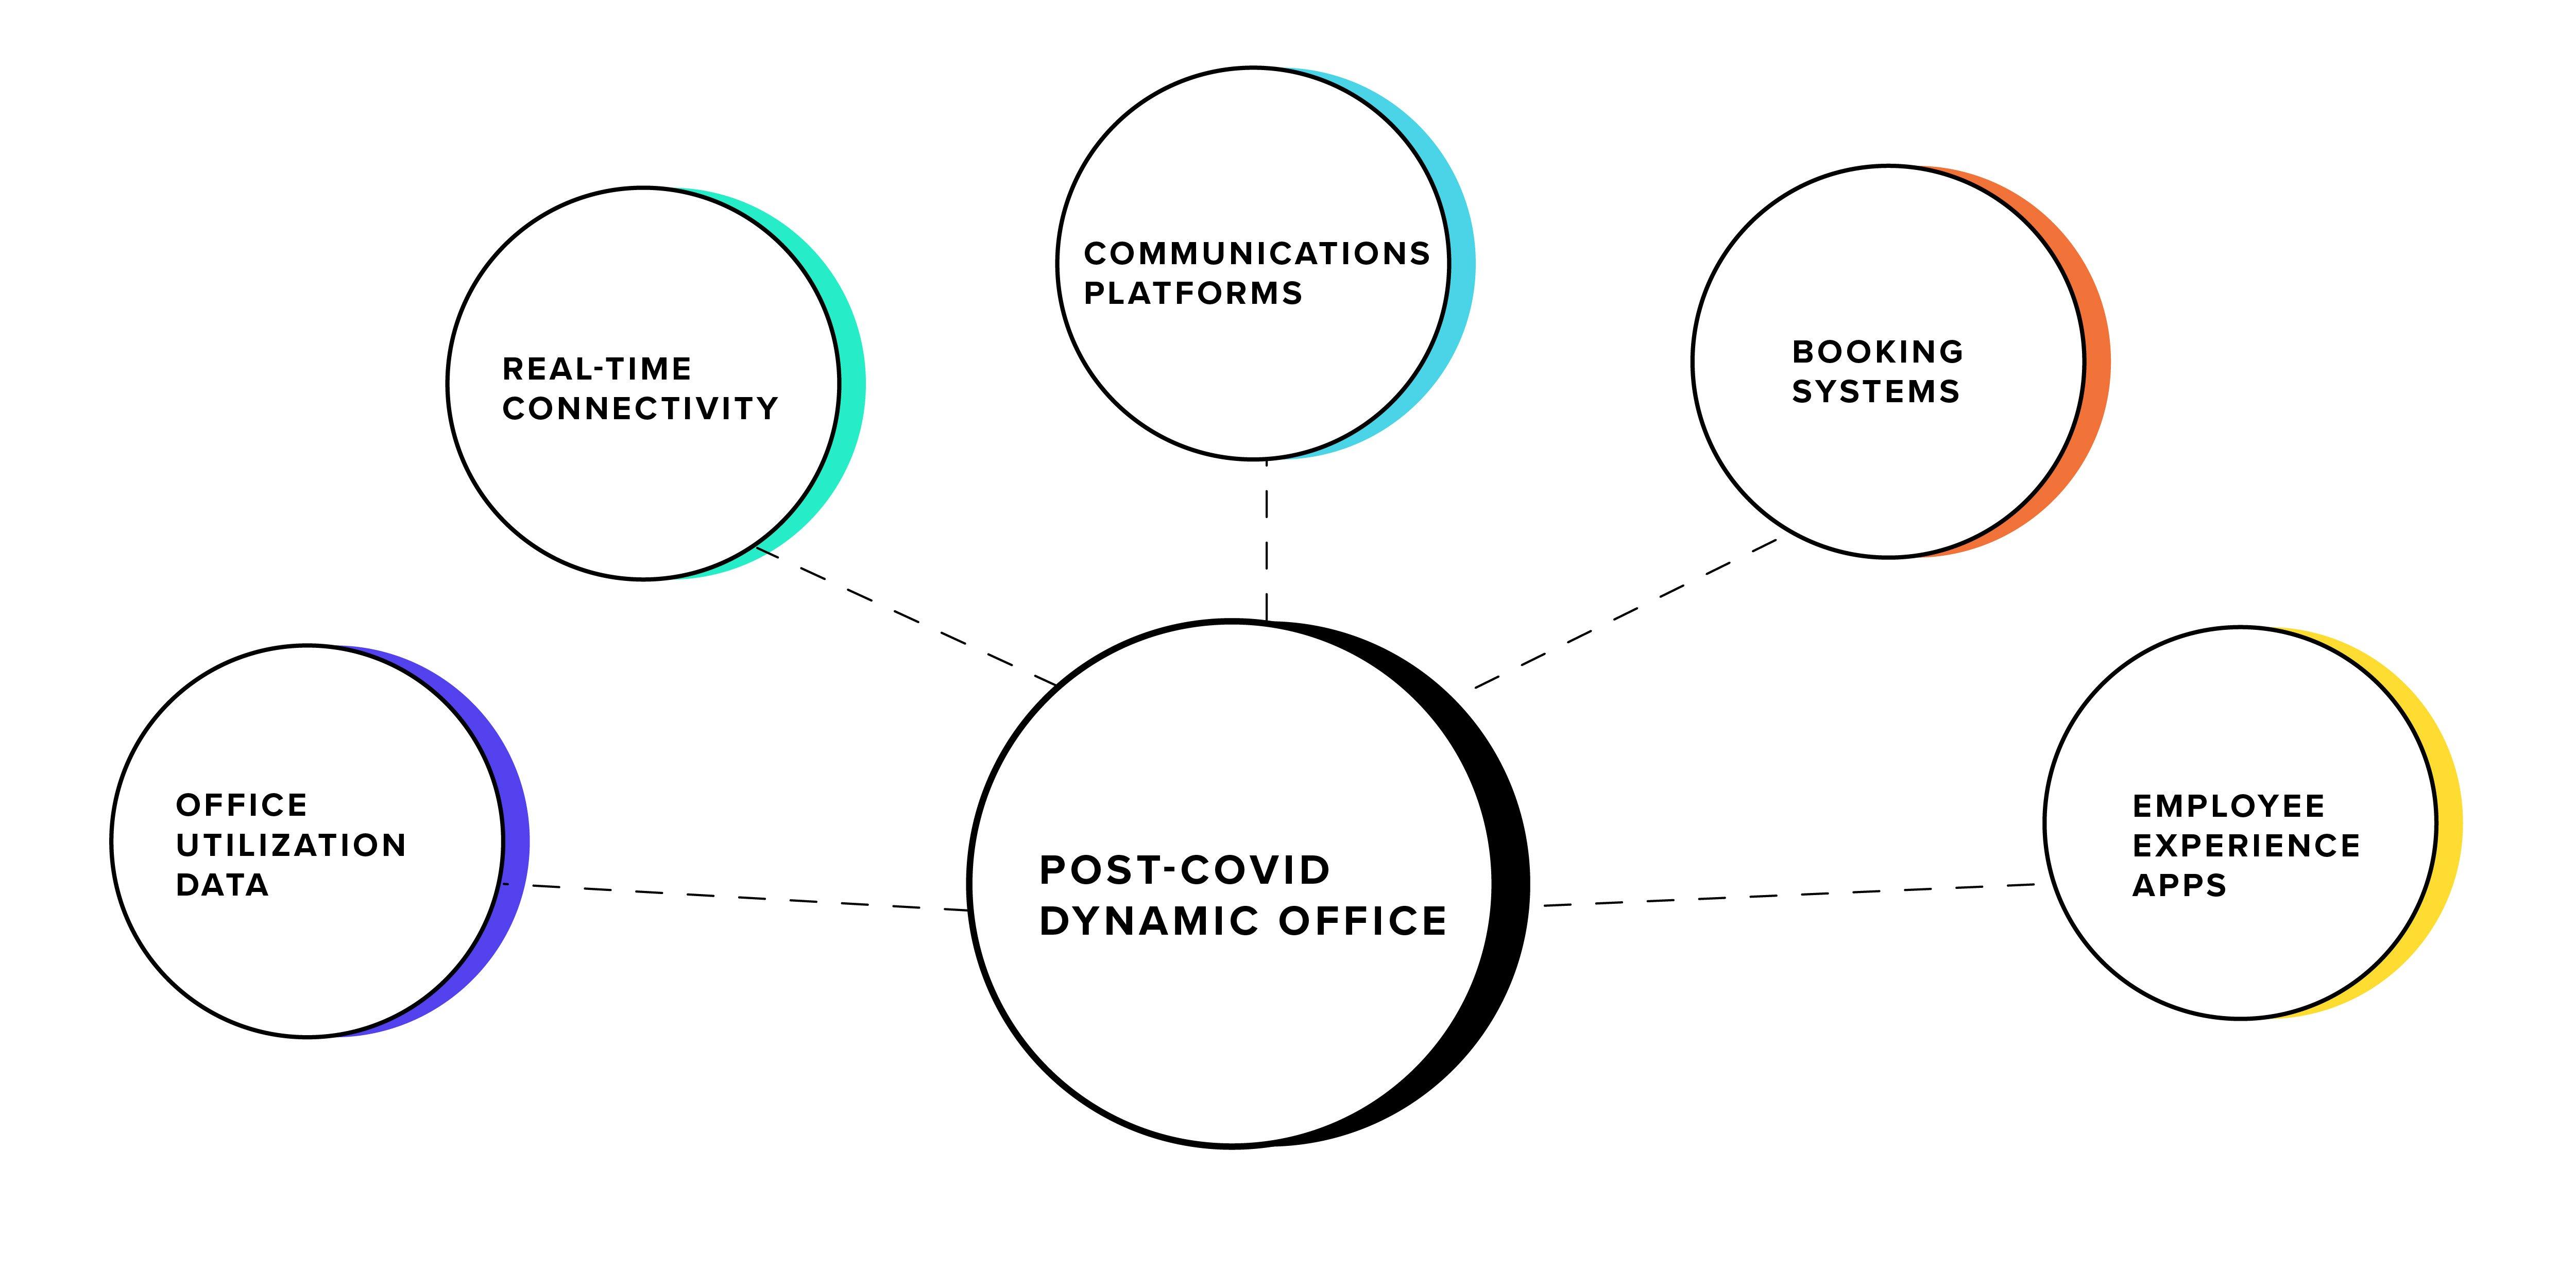 Post-COVID dynamic office diagram